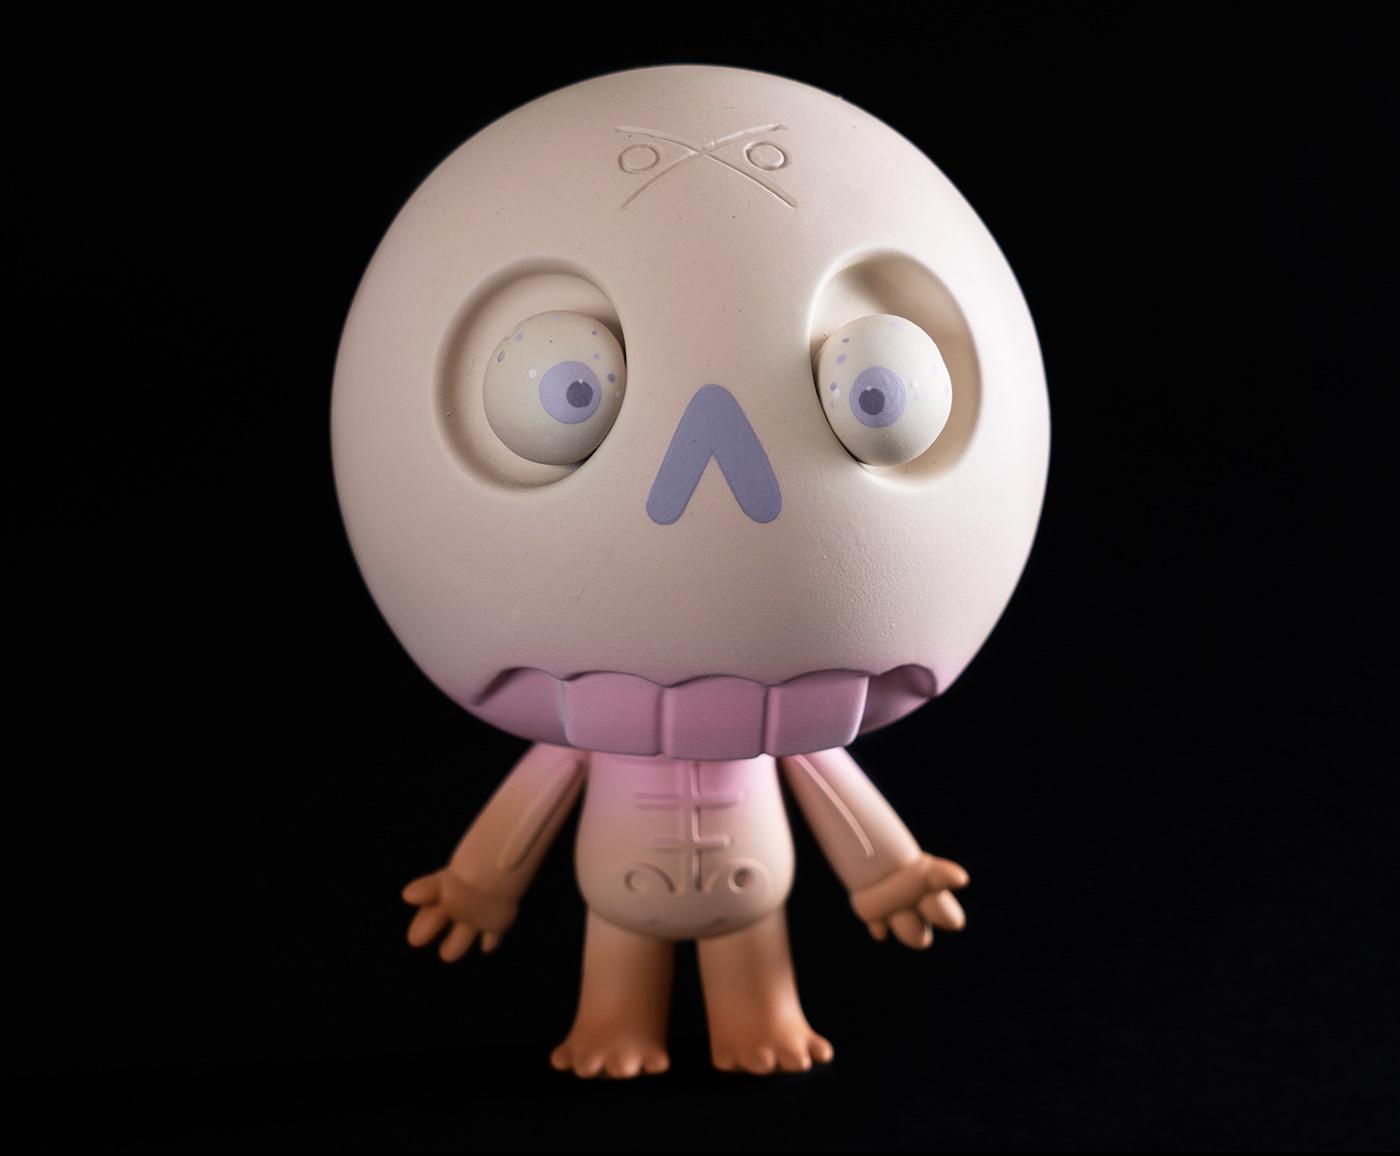 artoy Character design  Custom handmade sculpture skull toy toy design  toys